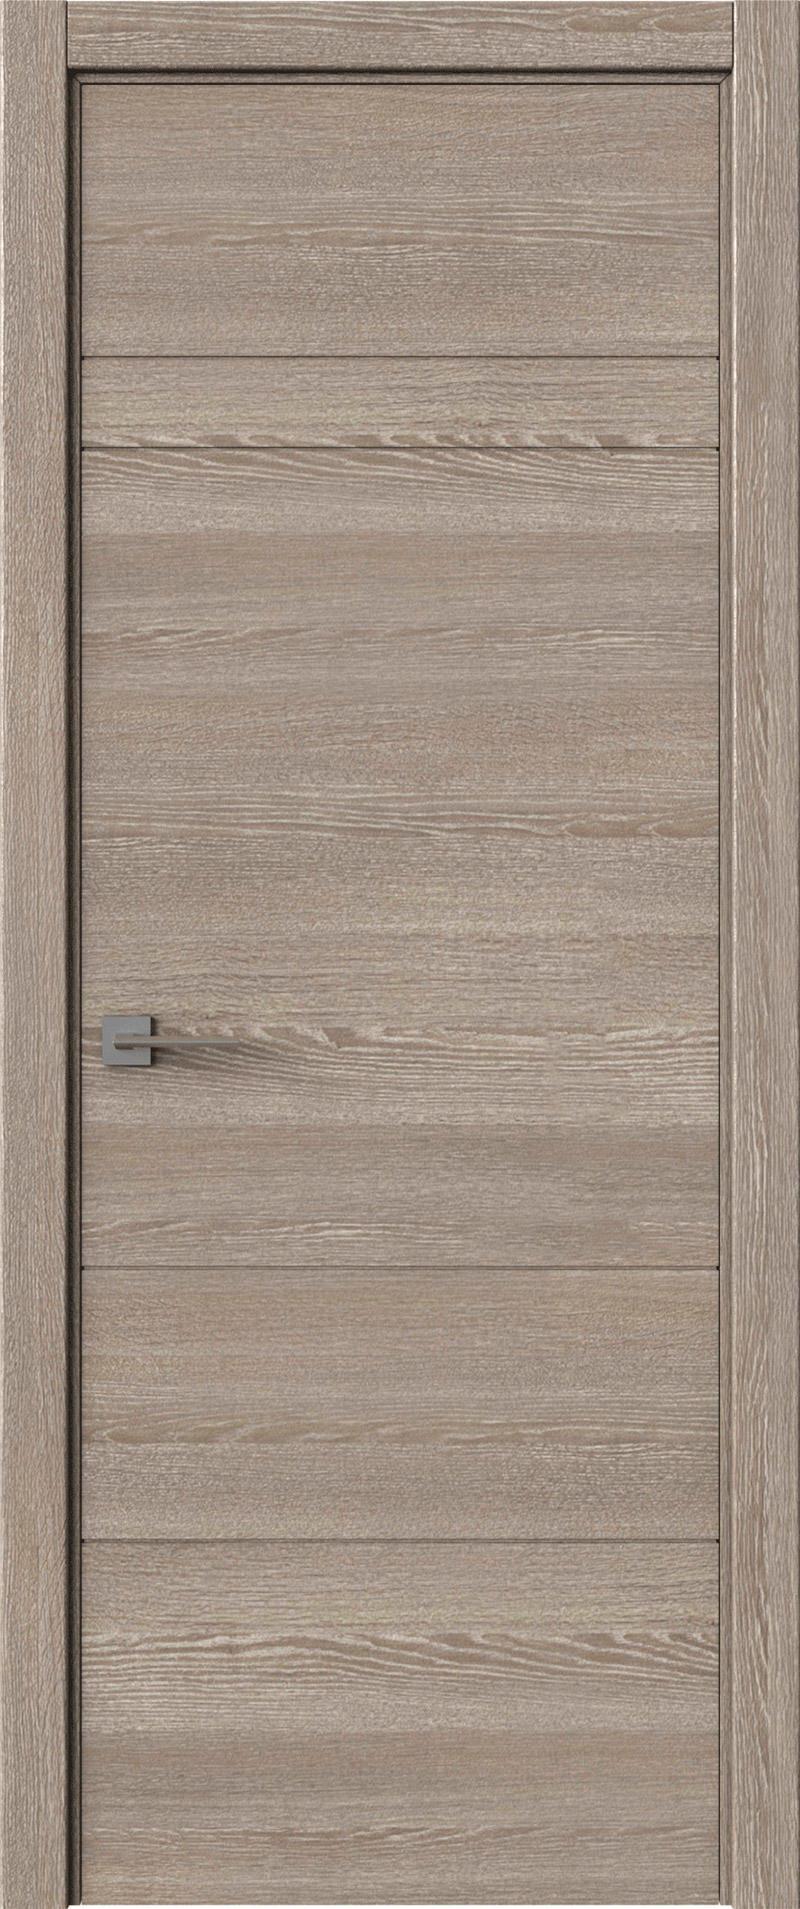 Tivoli К-2 цвет - Серый дуб Без стекла (ДГ)